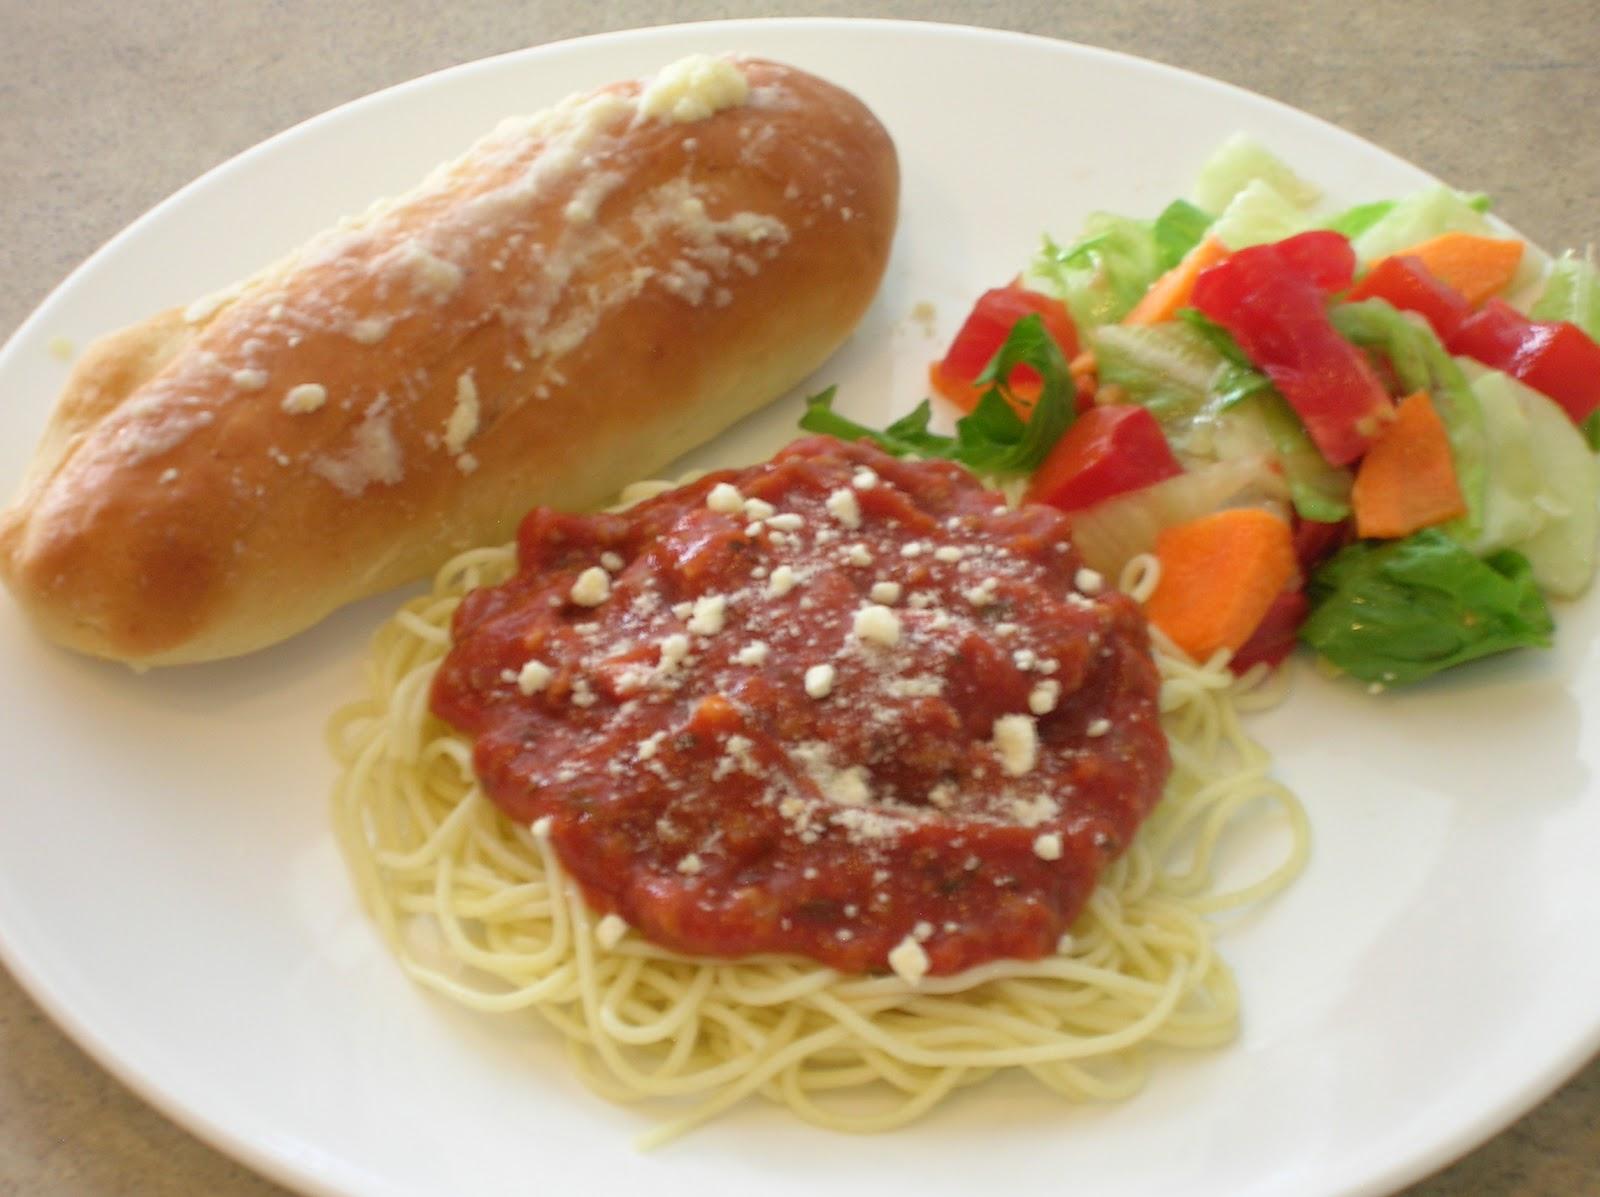 Simple Spaghetti Sauce - Saving Cent by Cent